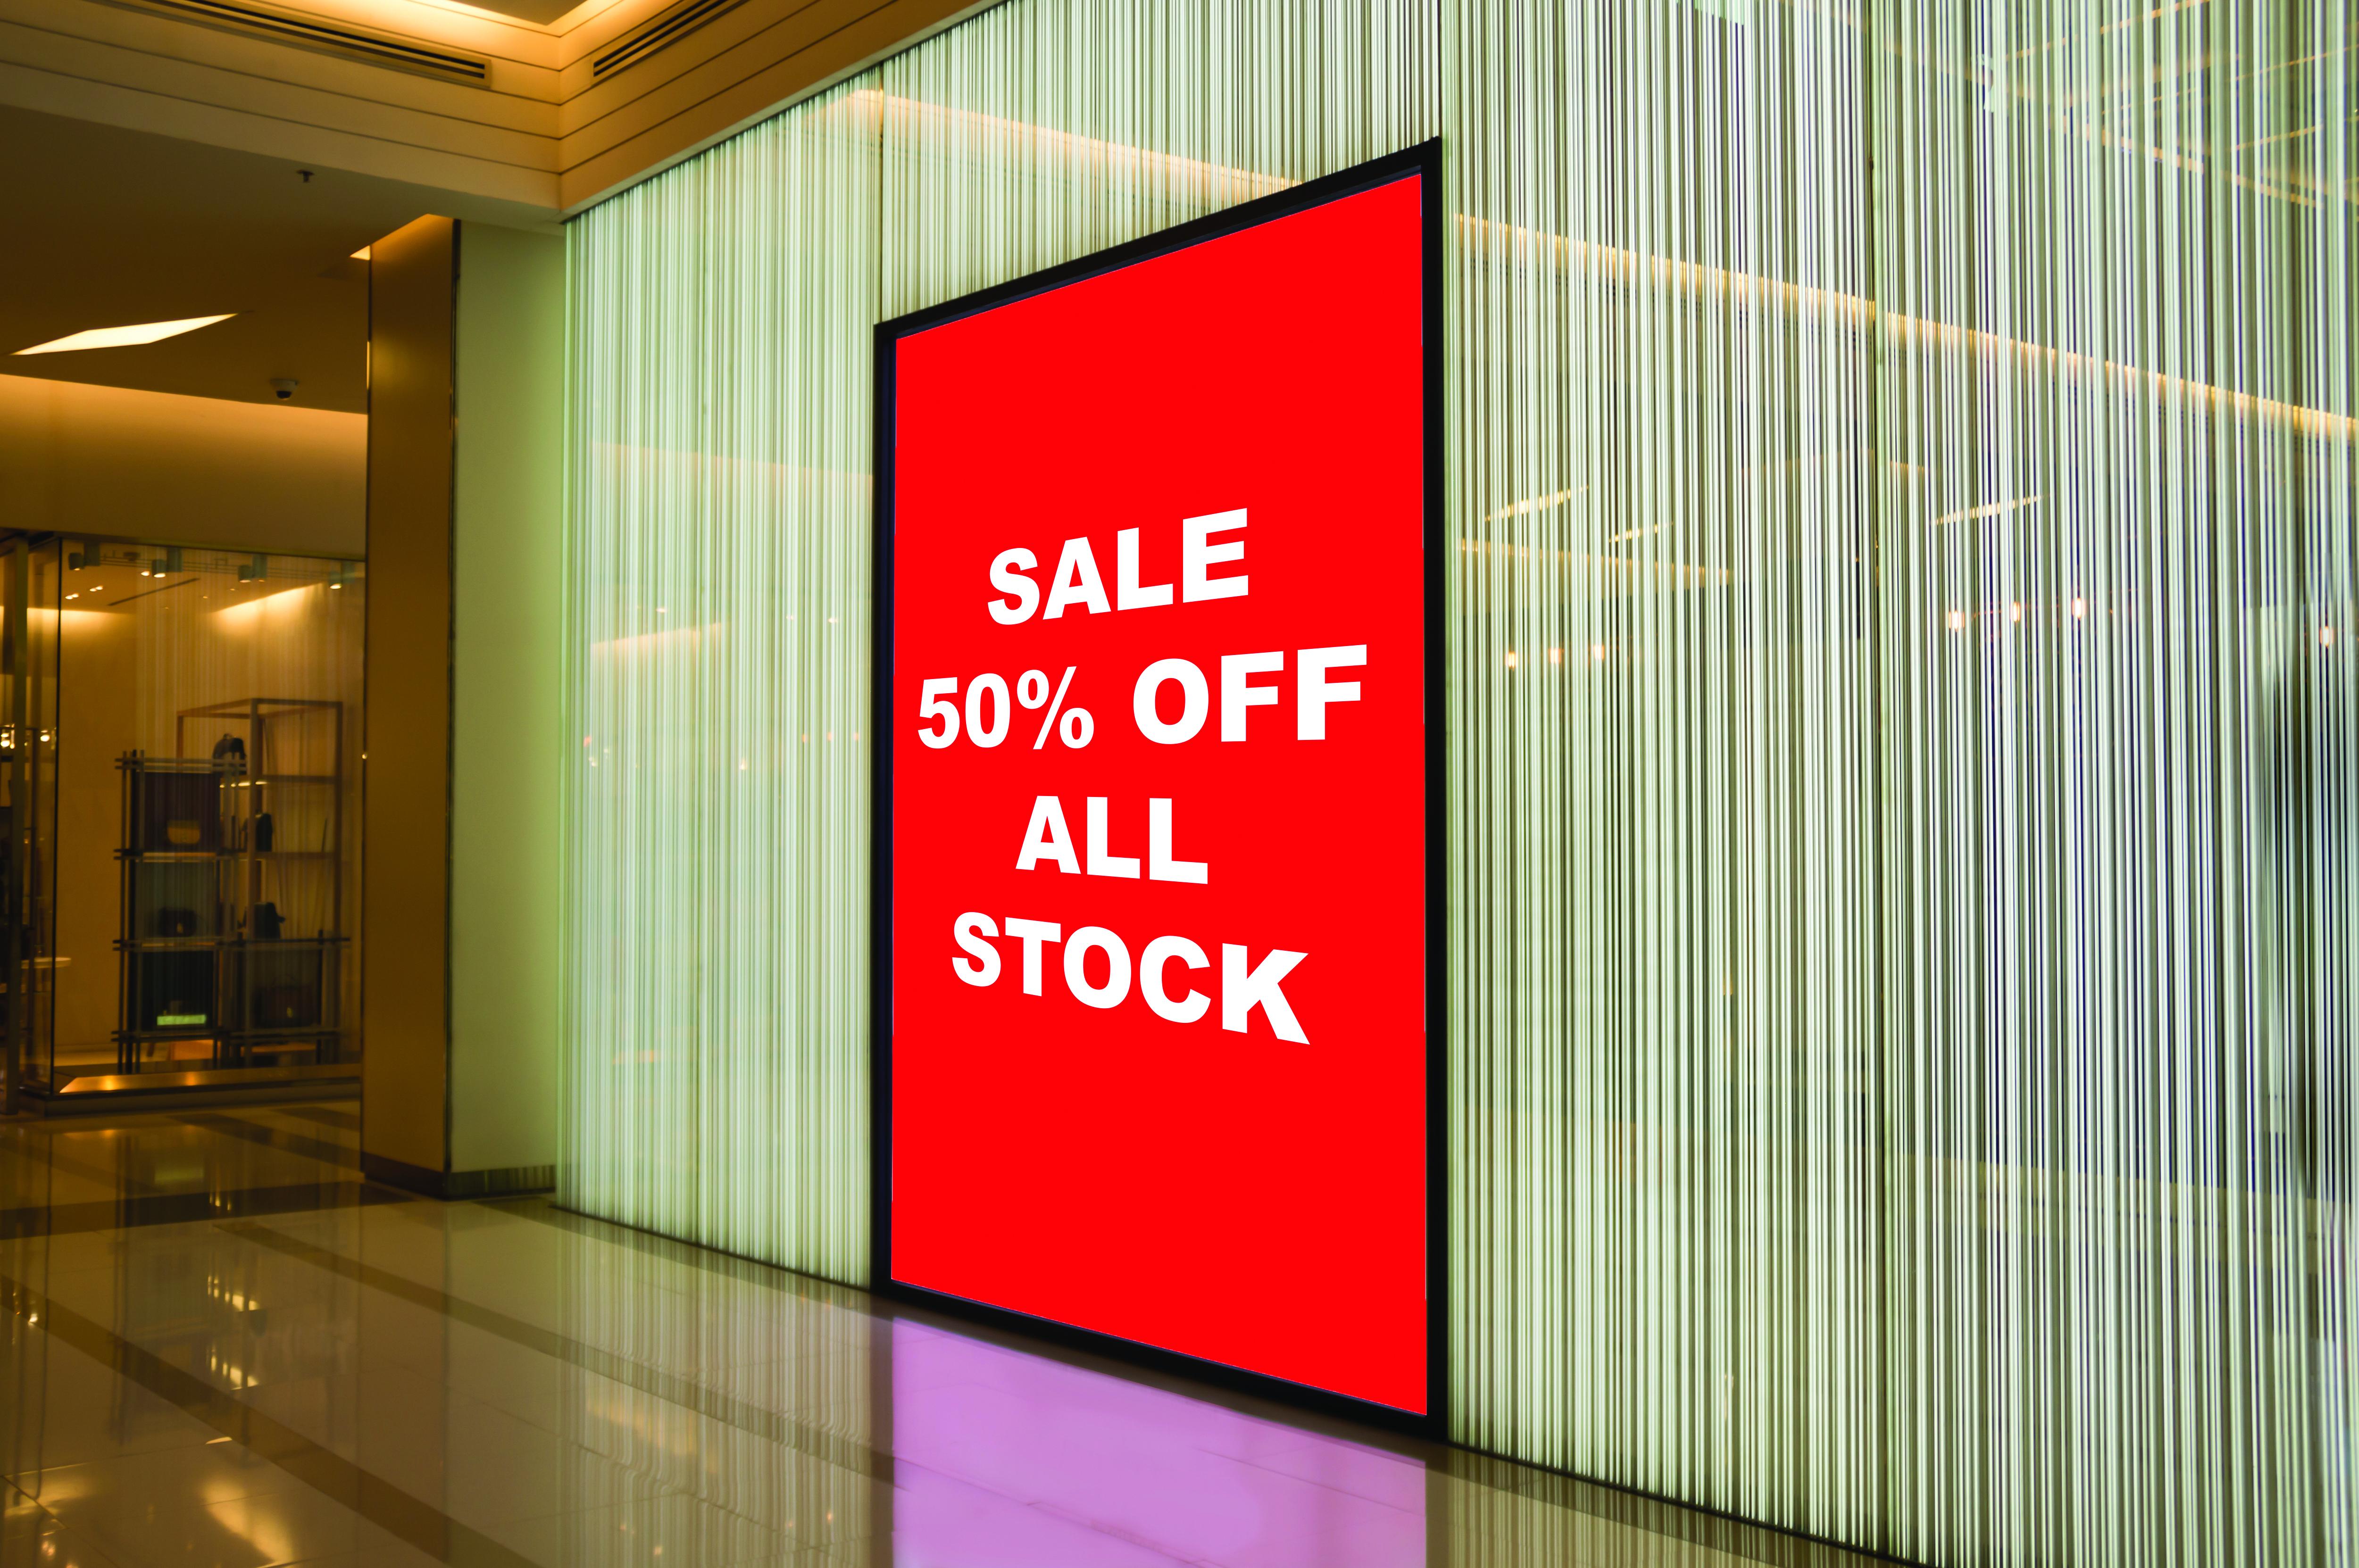 Digital signage showing store sale